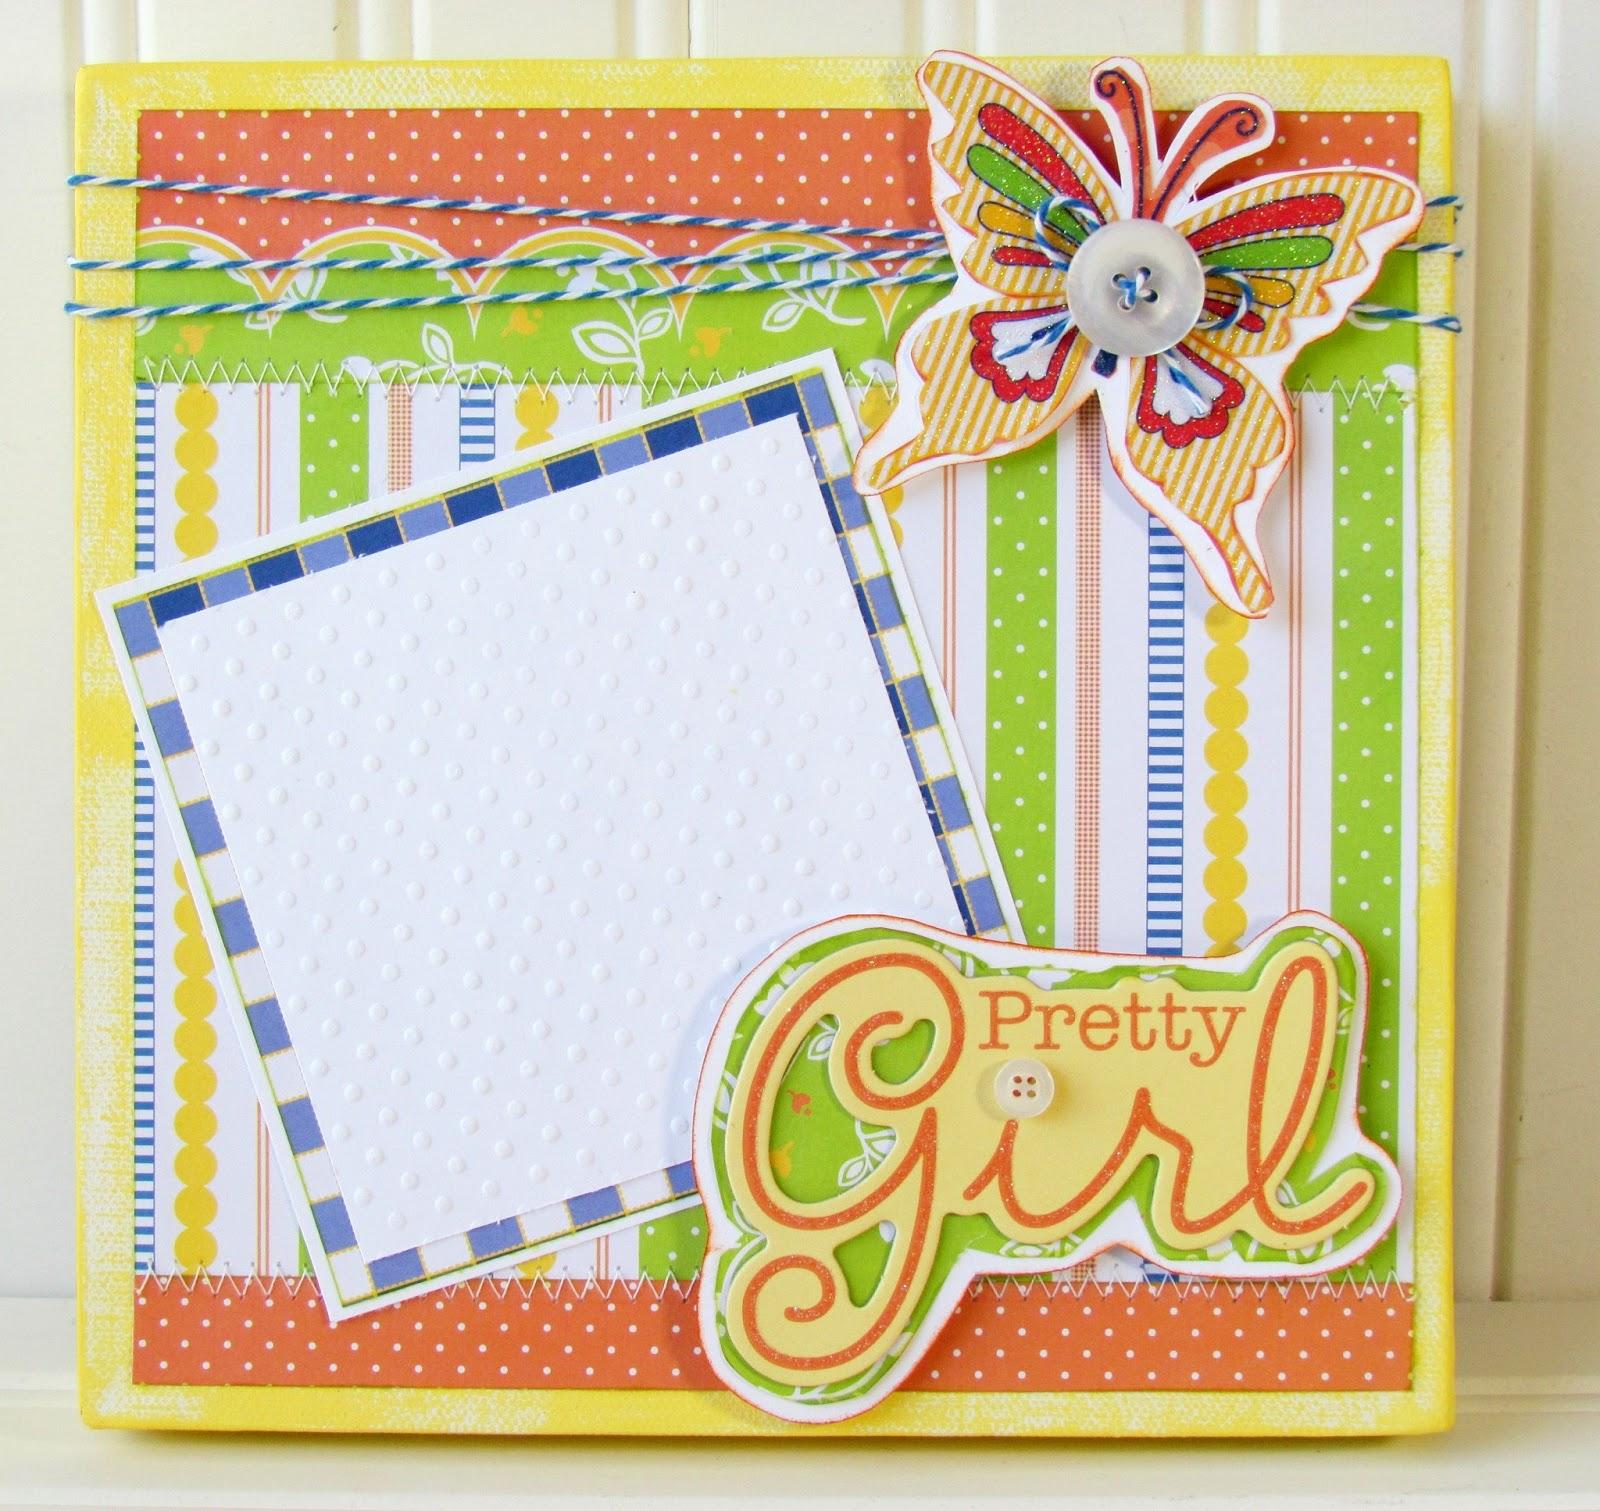 Pretty Girl Canvas Frame Ribbons Amp Glue